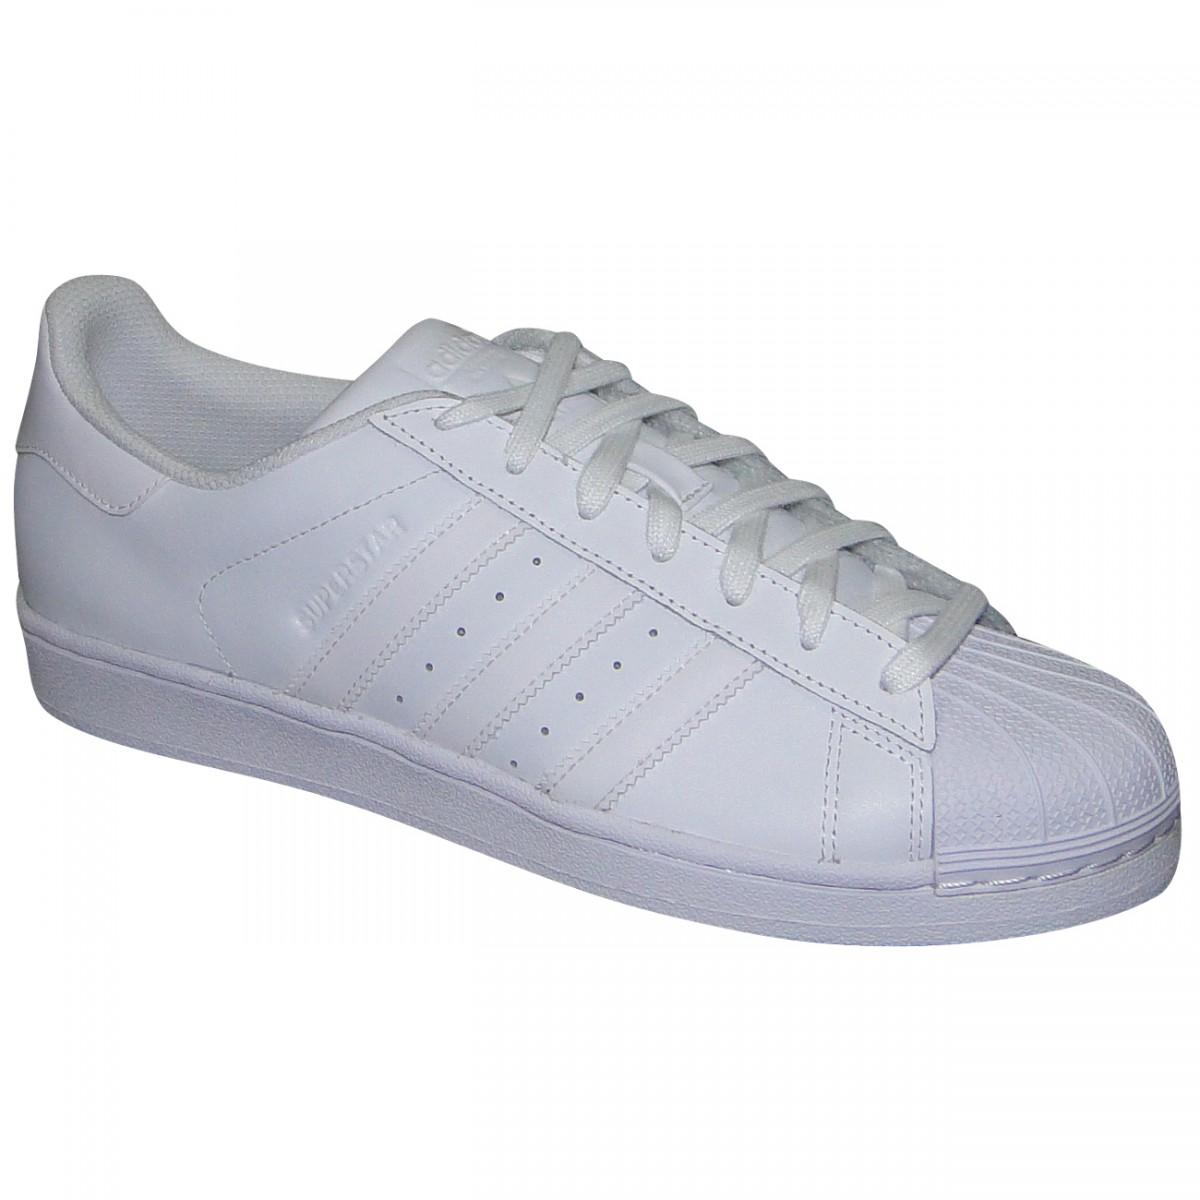 01cf2310d1 Tenis Adidas Superstar B27136 - Branco Branco - Chuteira Nike ...